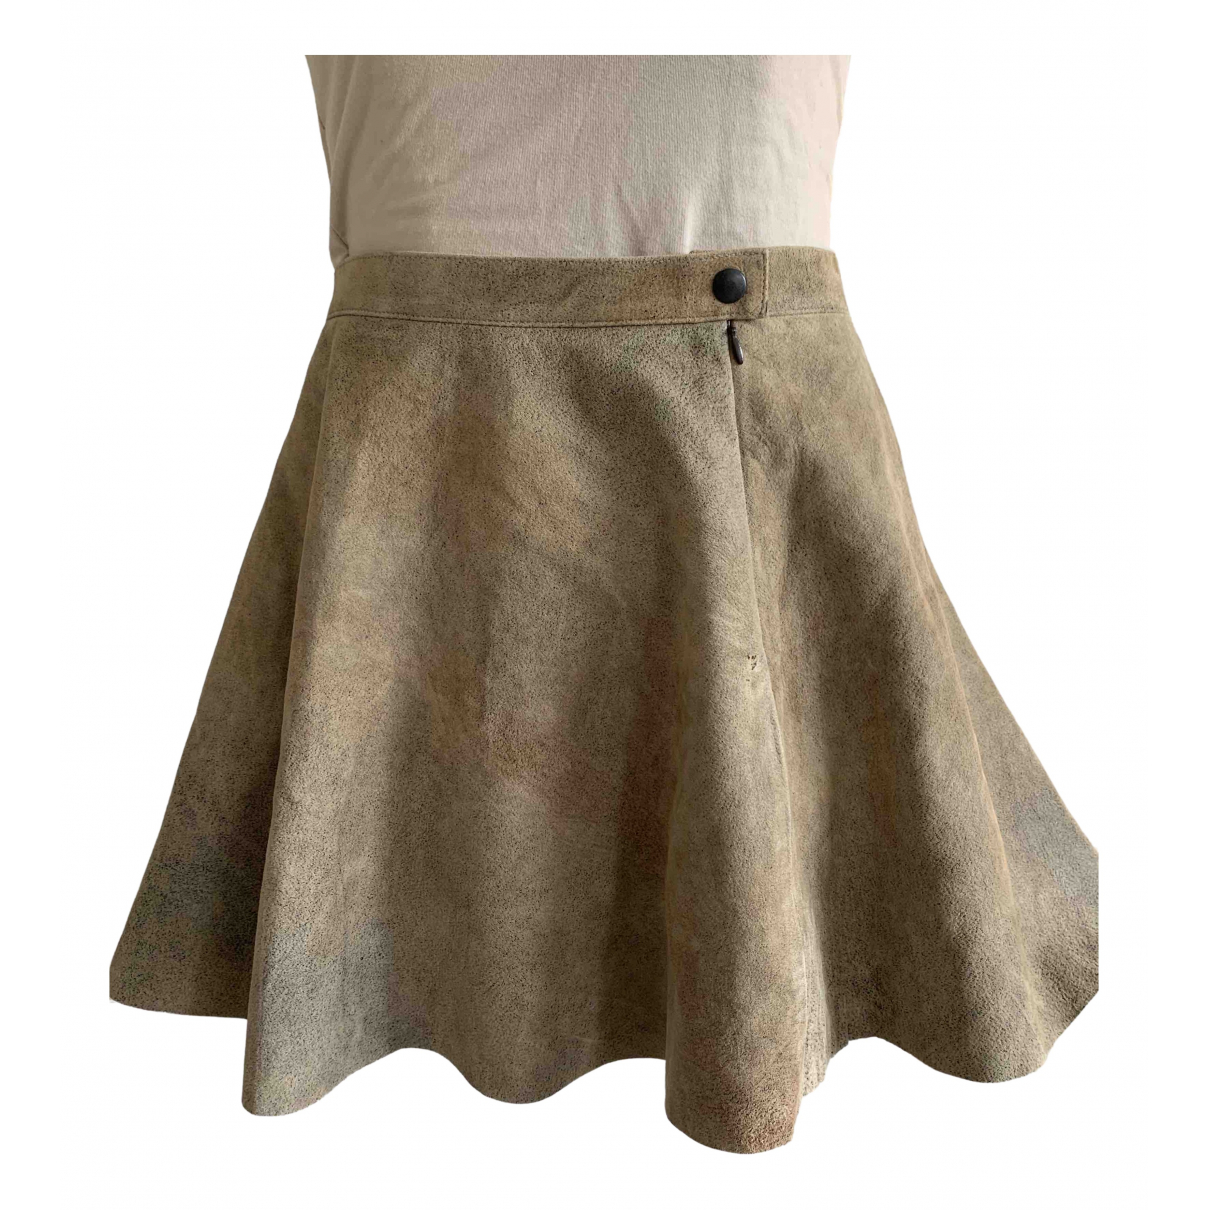 American Apparel - Jupe   pour femme en cuir - beige